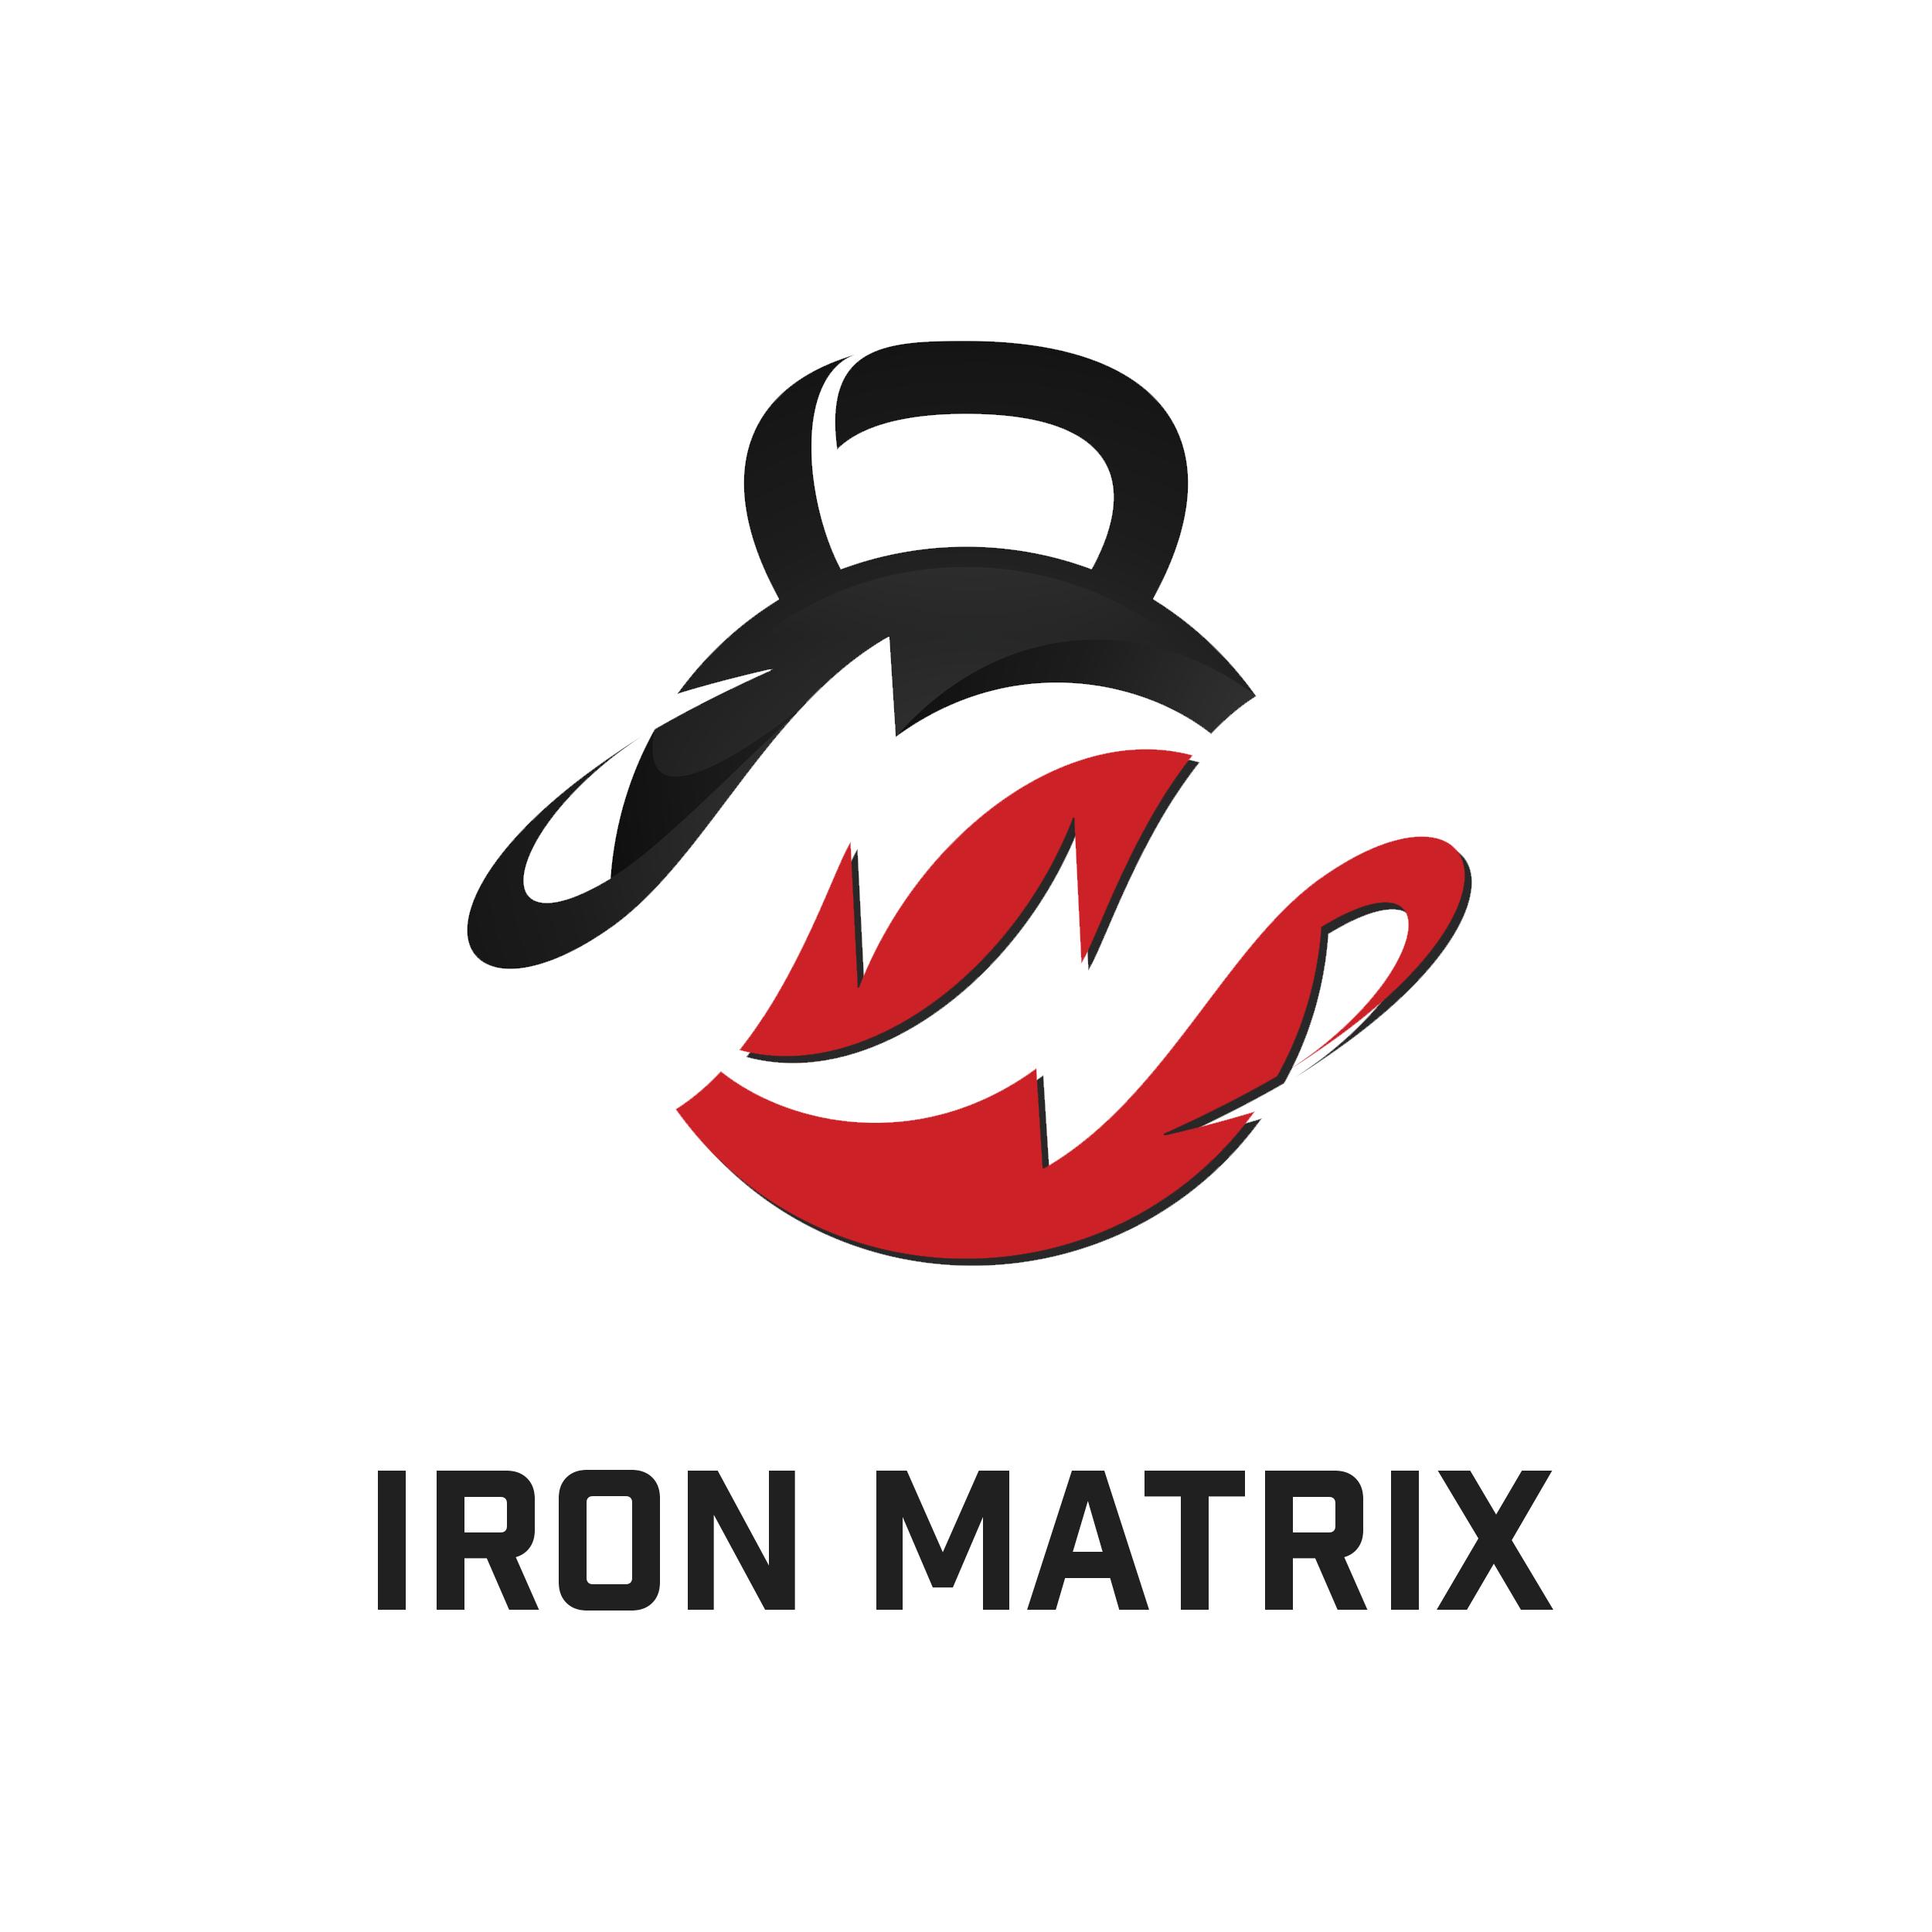 IRON MATRIX PNG